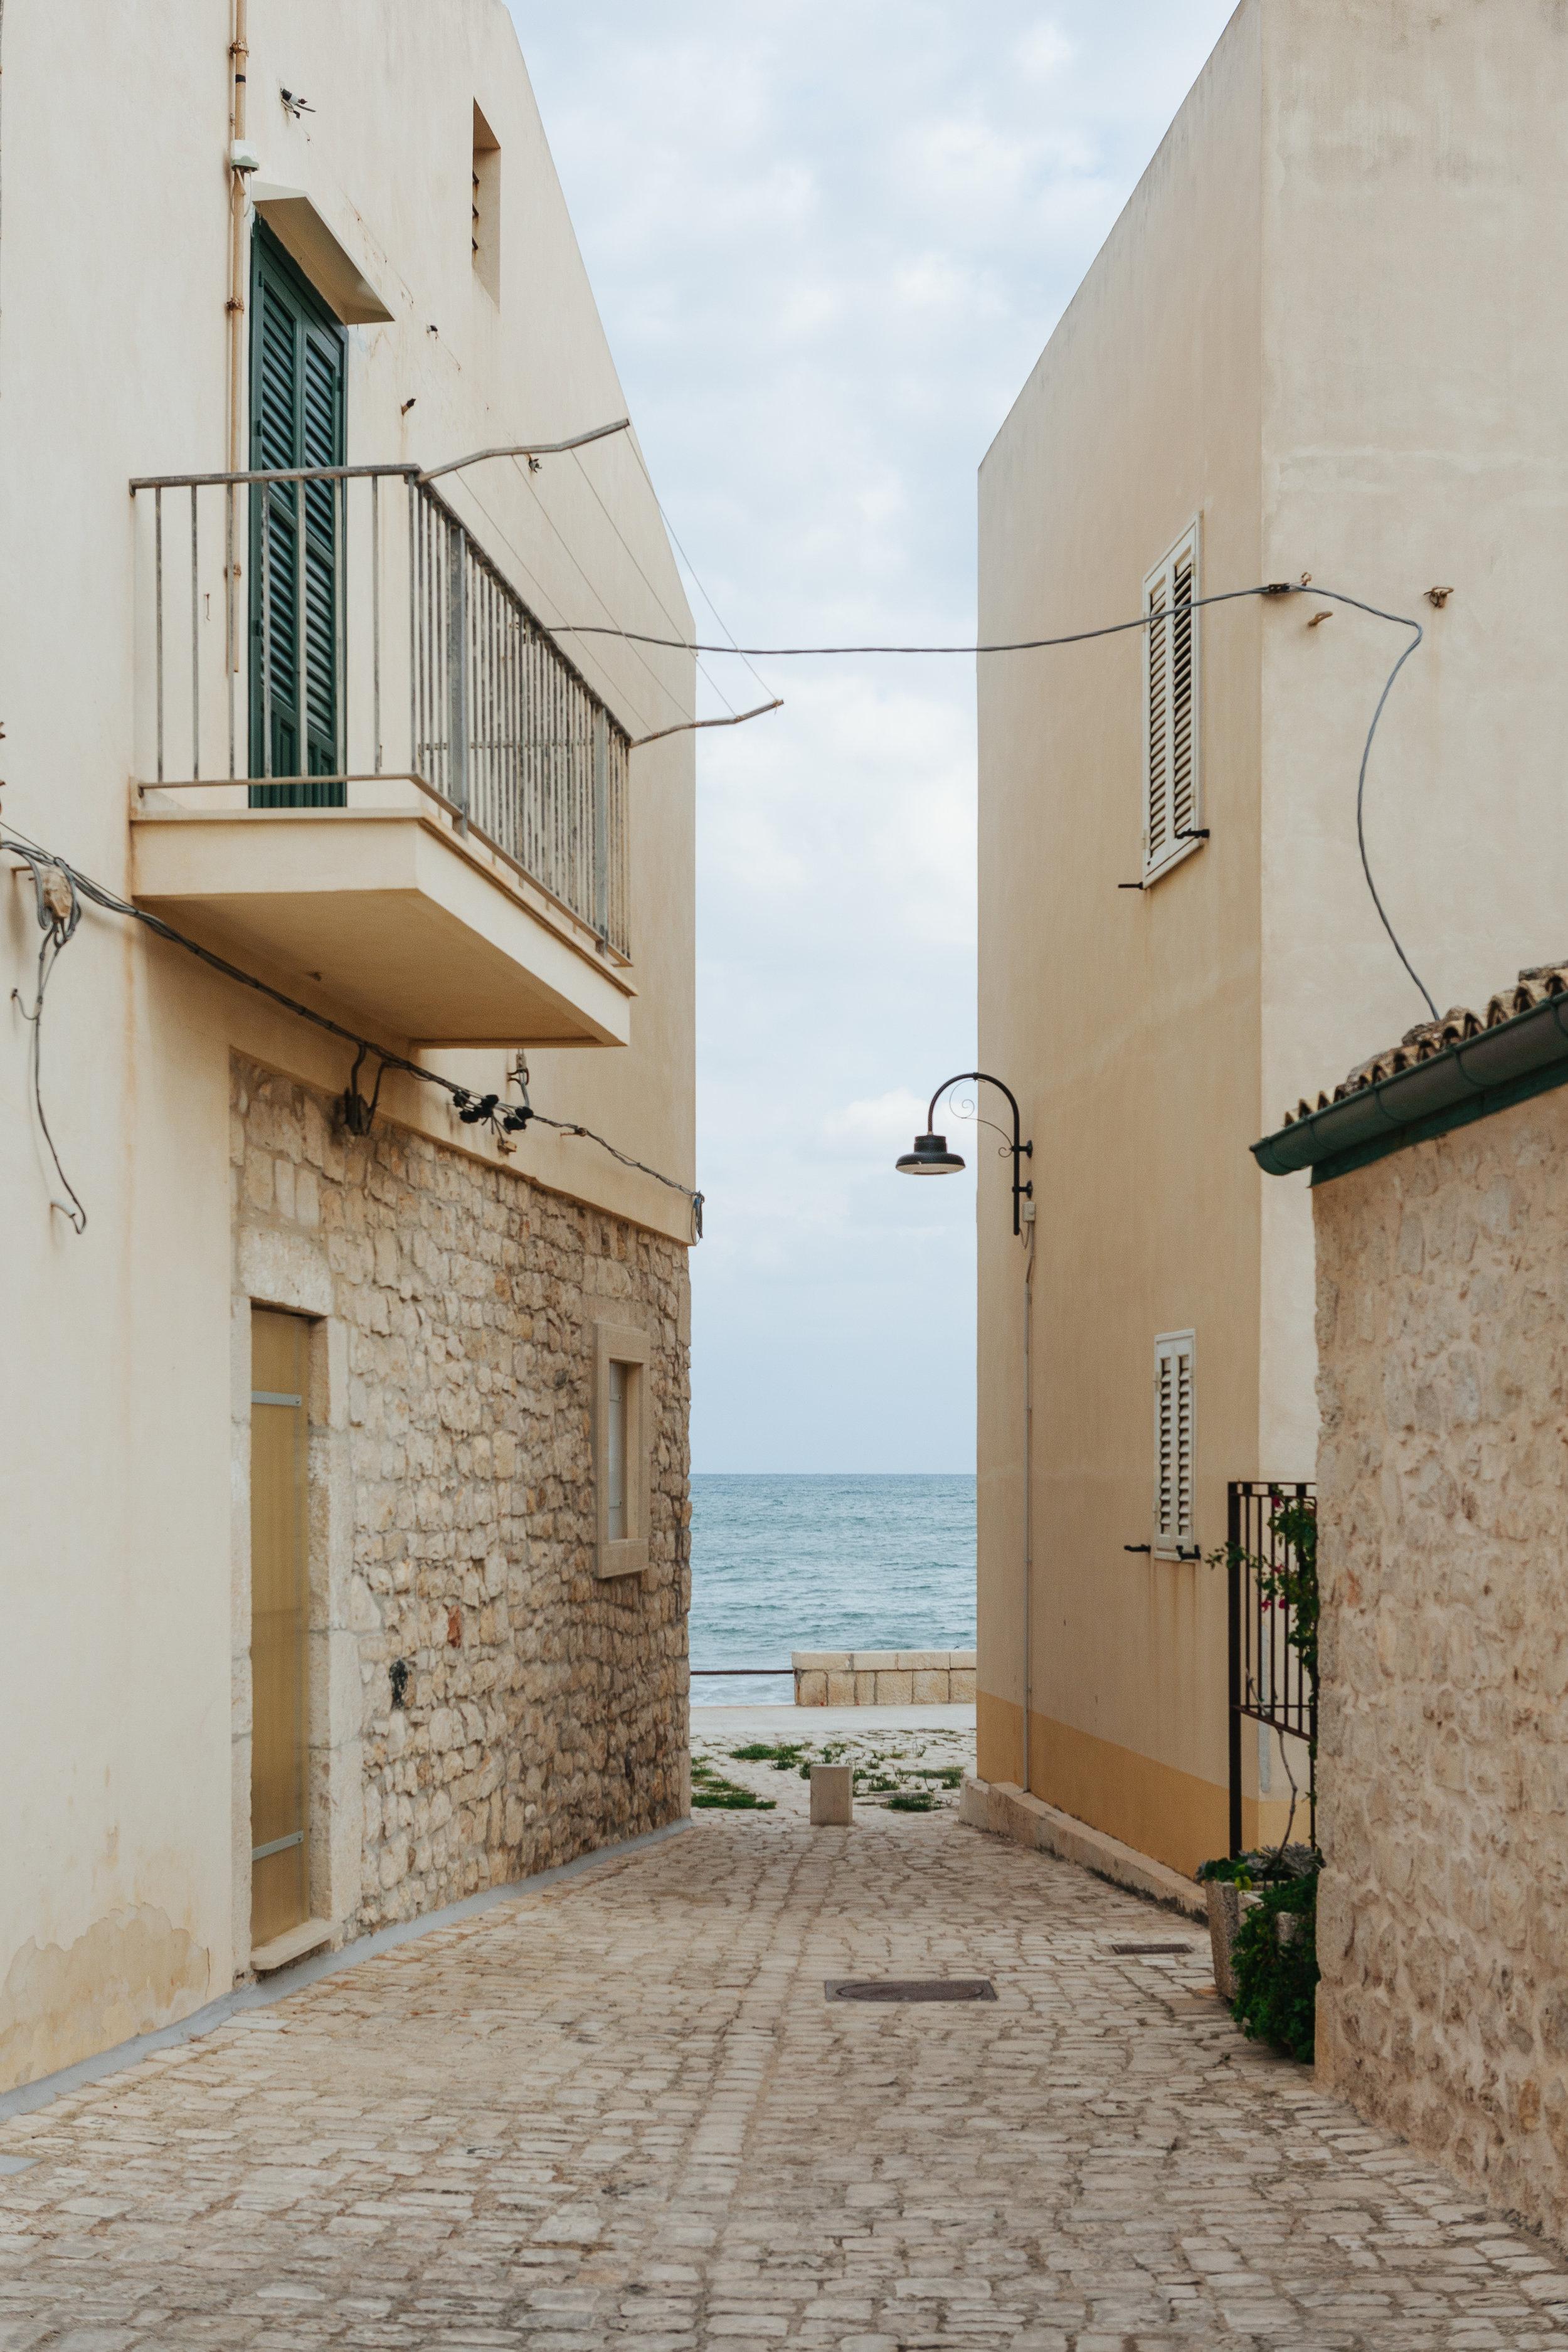 40sampieri-casa-vacanze-sicilia-appartamento-sicily-holiday-apartment-casazzurra-italia-italy.jpg